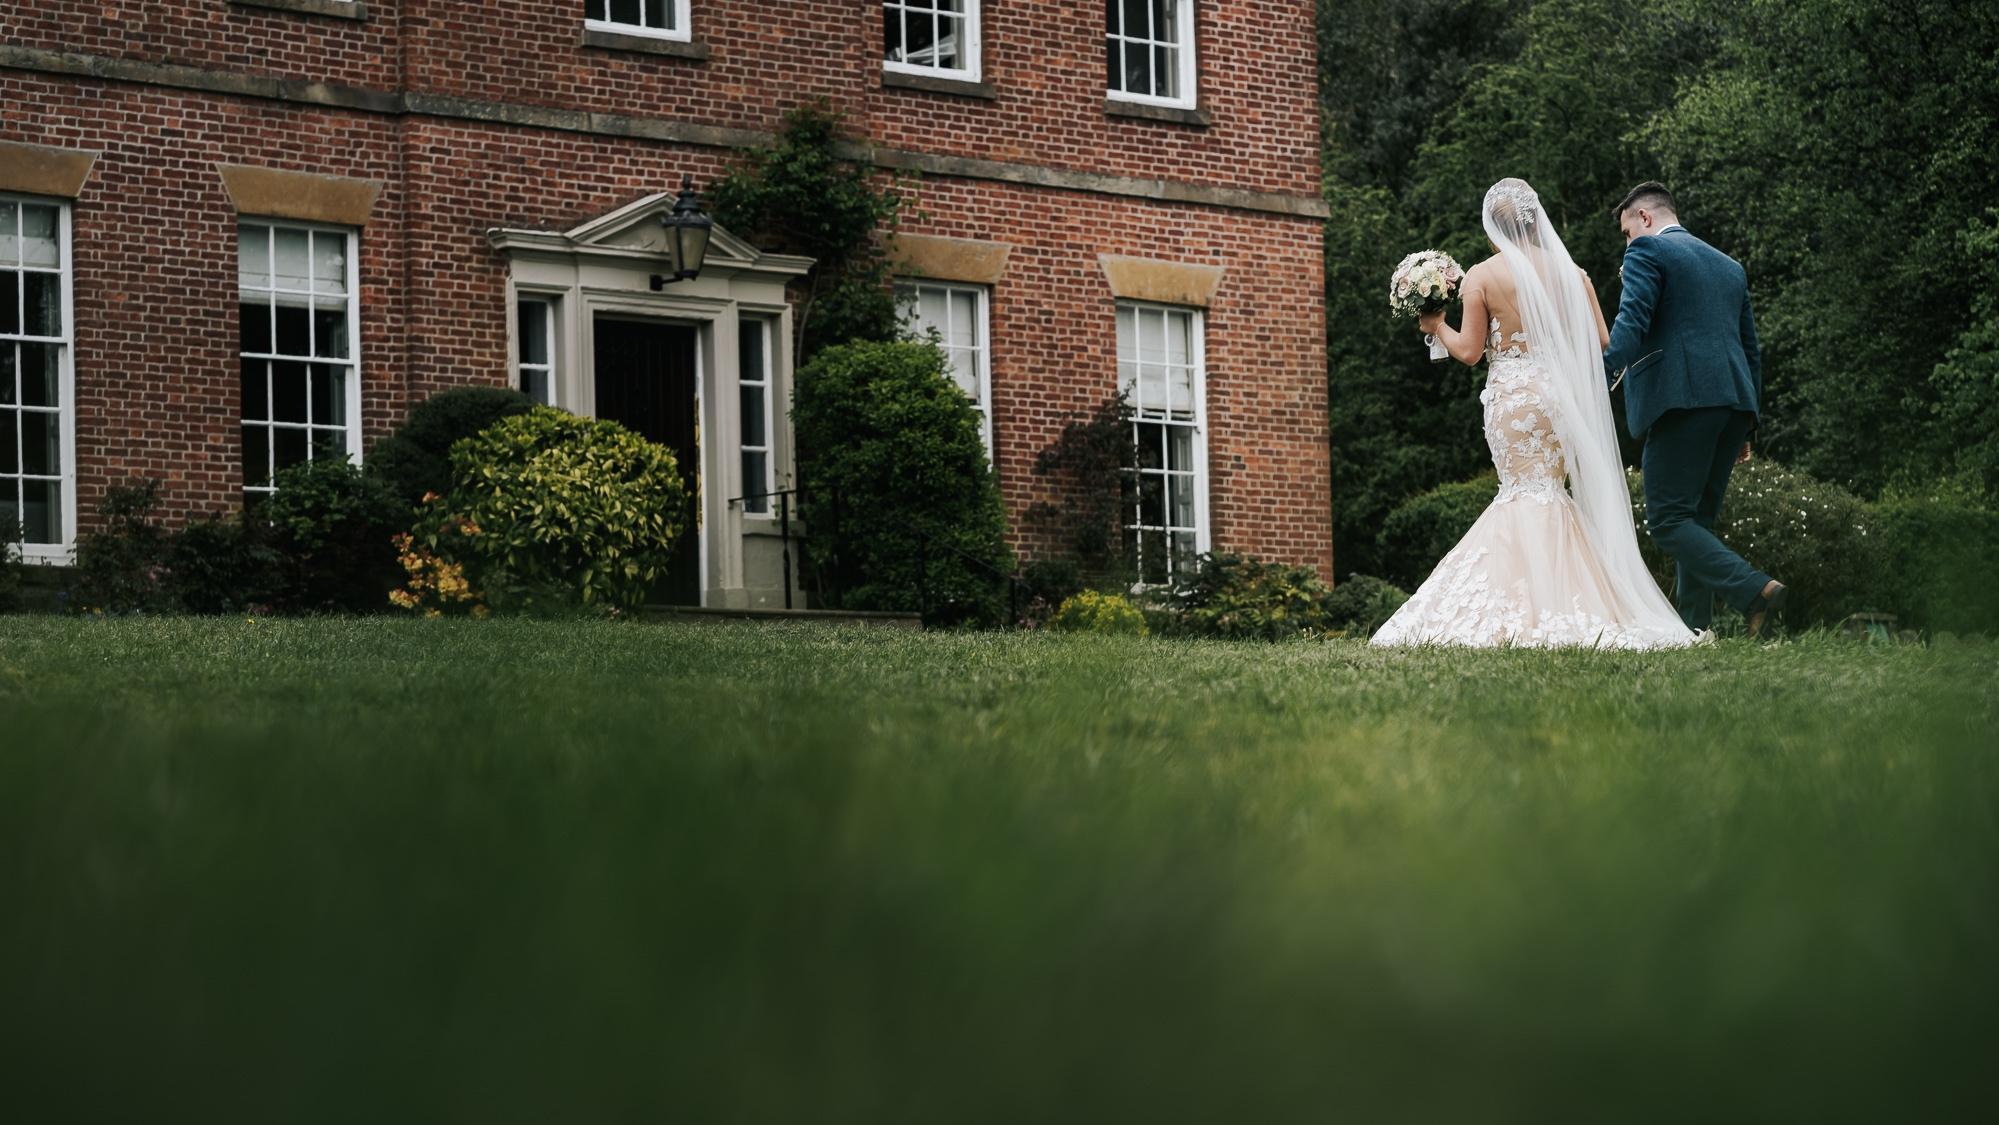 Rivington+Hall+Barn+Wedding+PHotographer+lancashire+wedding+photography+%2826+of+34%29.jpg